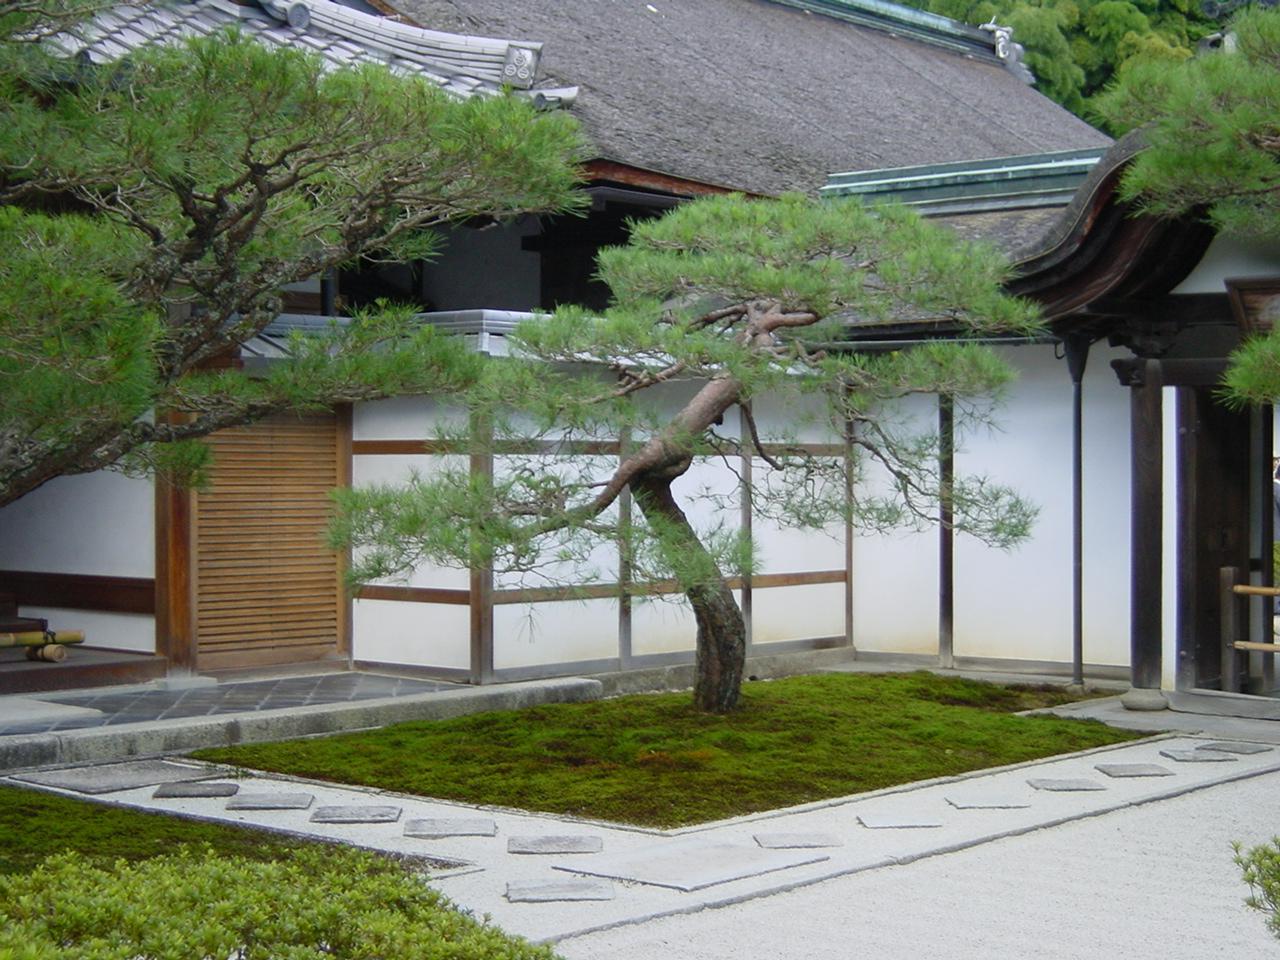 صوره حدائق يابانيه , ديكورات للحدائق